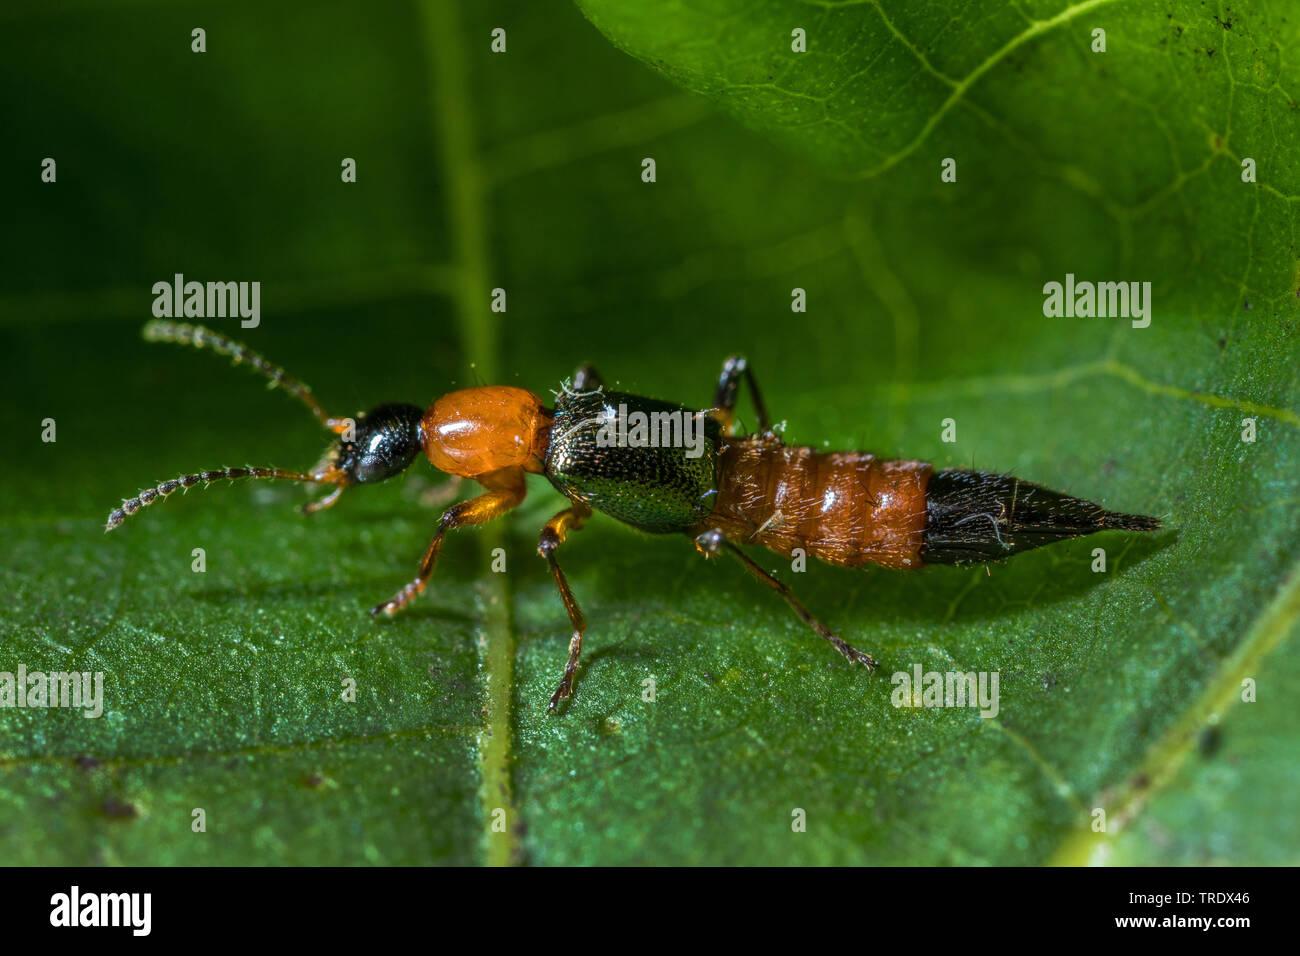 Bunter Uferkurzfluegler (Paederus riparius), sitzt auf einem Blatt, Deutschland | rove beetle (Paederus riparius), sitting on a leaf, Germany | BLWS51 - Stock Image